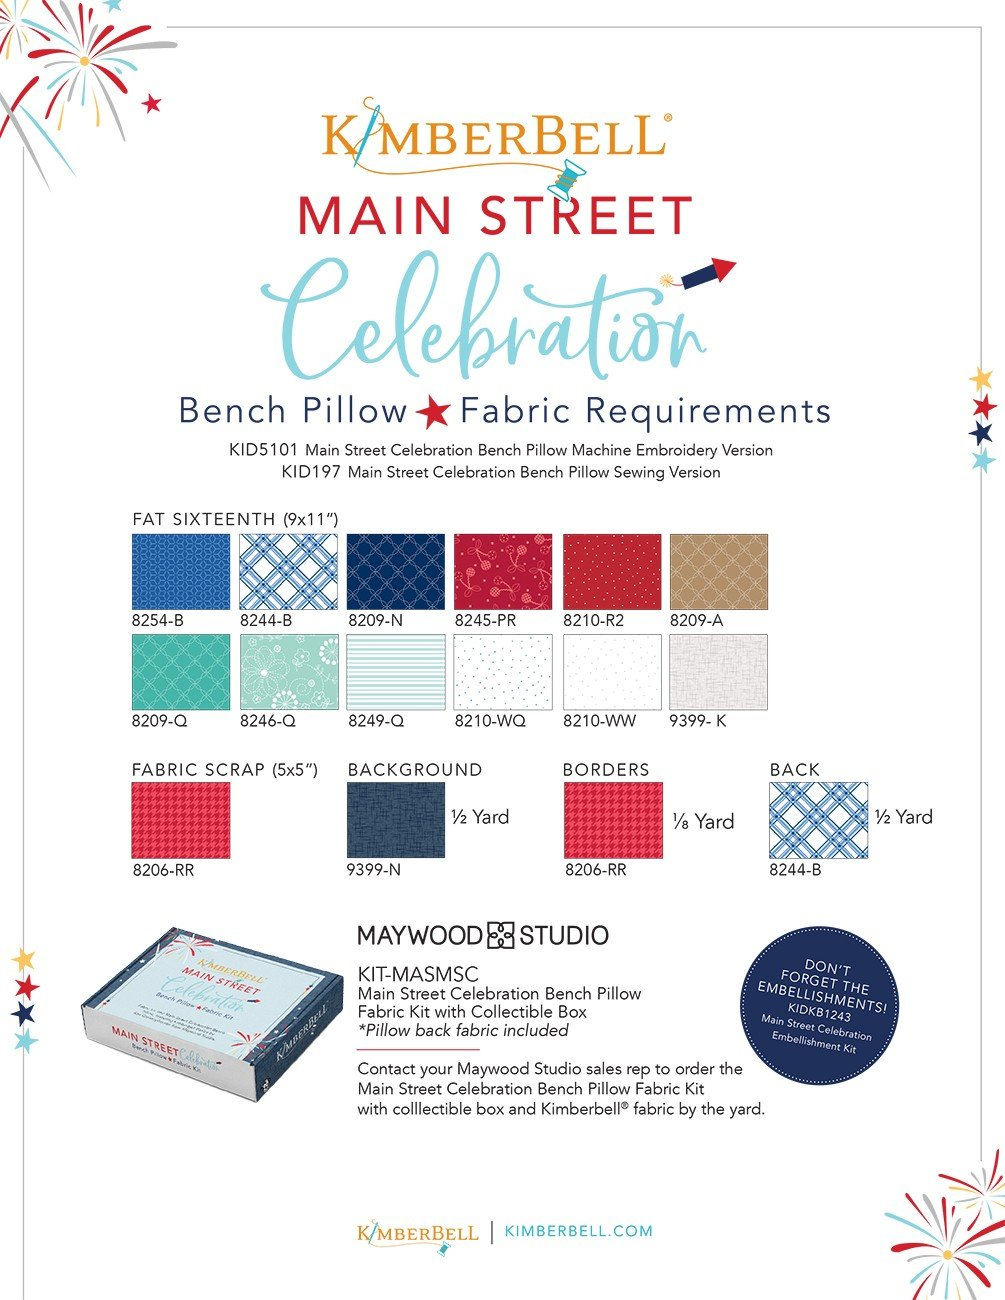 Main Street Celebration Bench Pillow Fabric Kit from Kimberbell